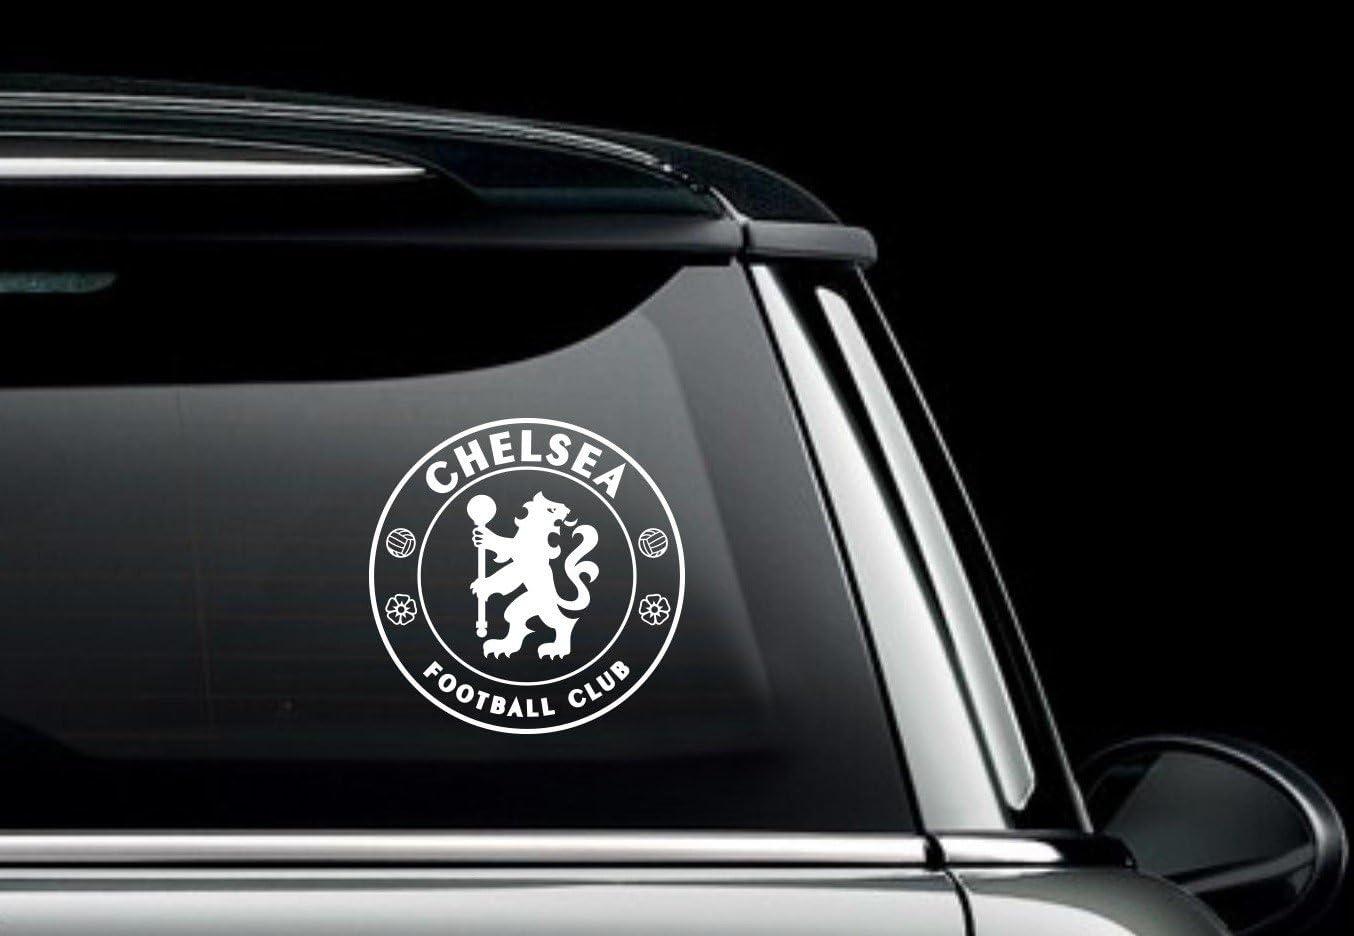 Maple Enterprise Chelsea Football Club Logo Vinyl Decal Sticker White Amazon Ca Automotive [ 936 x 1354 Pixel ]